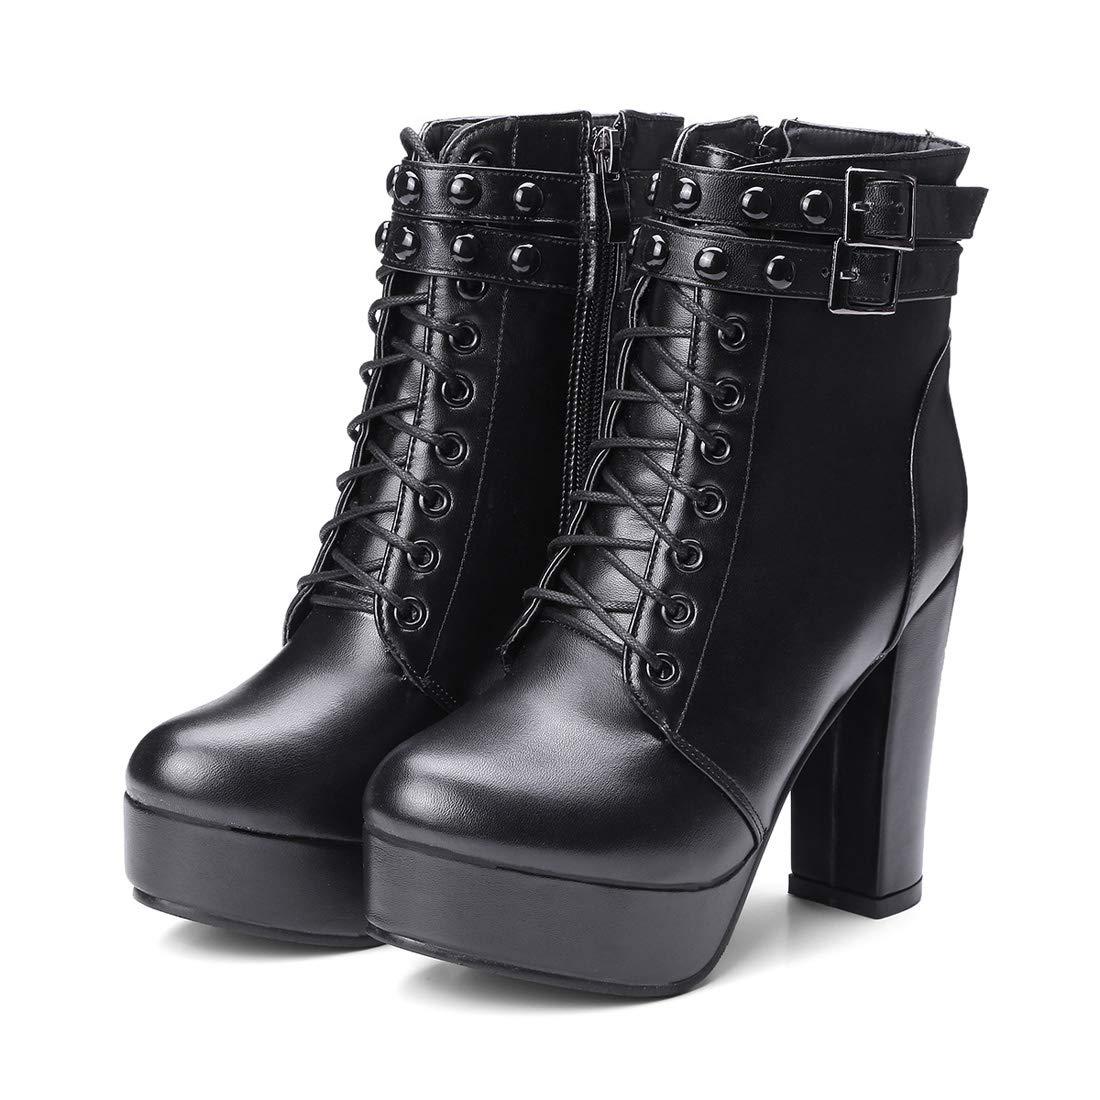 DANDANJIE Damenschuhe Comfort Basic Pump Stiefel Wanderschuhe Blockabsatz Stiefeletten für den Herbst Winter